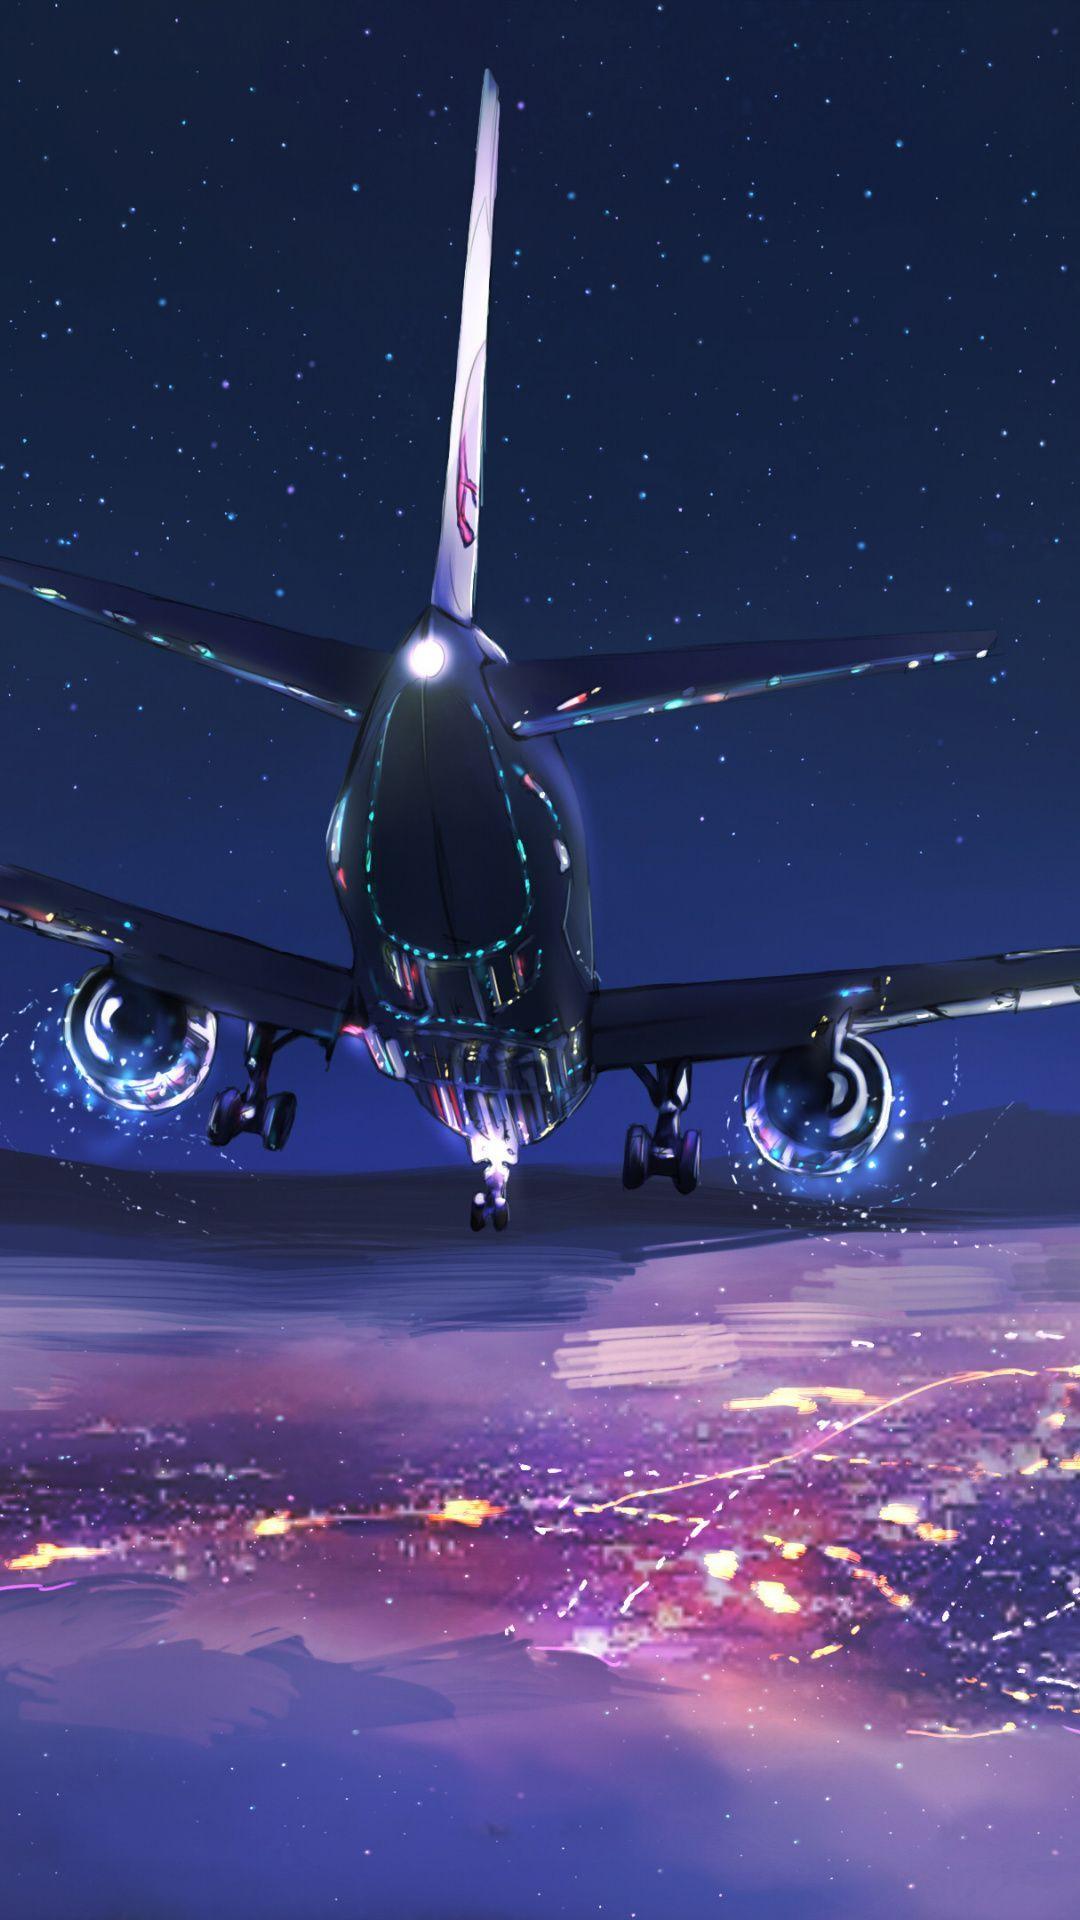 Aircraft Sky Night Photography Wallpaper Airplane Photography Airplane Wallpaper